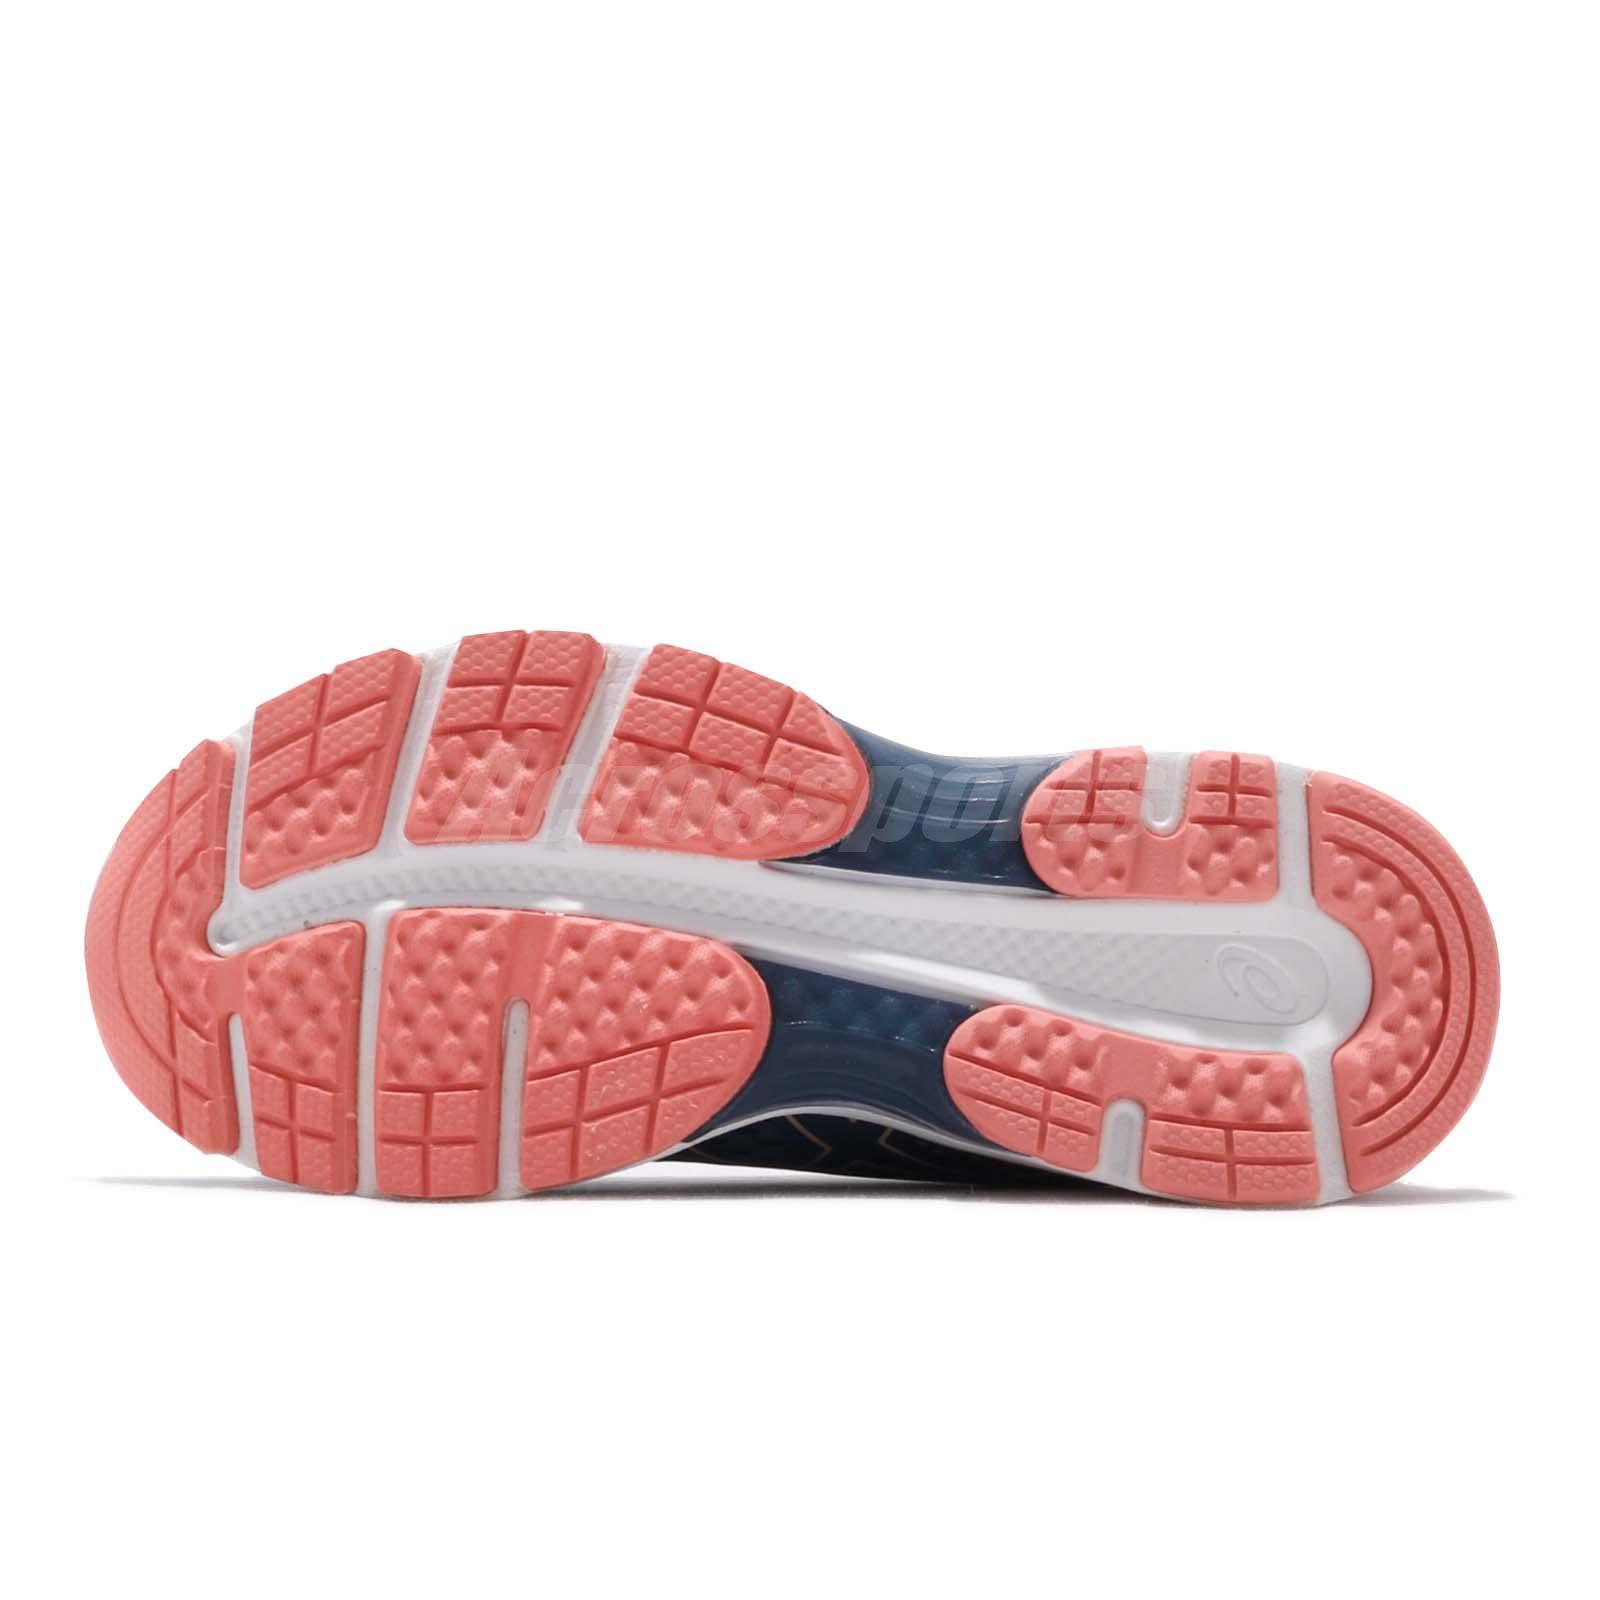 2f0f32c115e Asics Gel-Pulse 10 Grand Shark Baked Pink Women Running Shoes ...